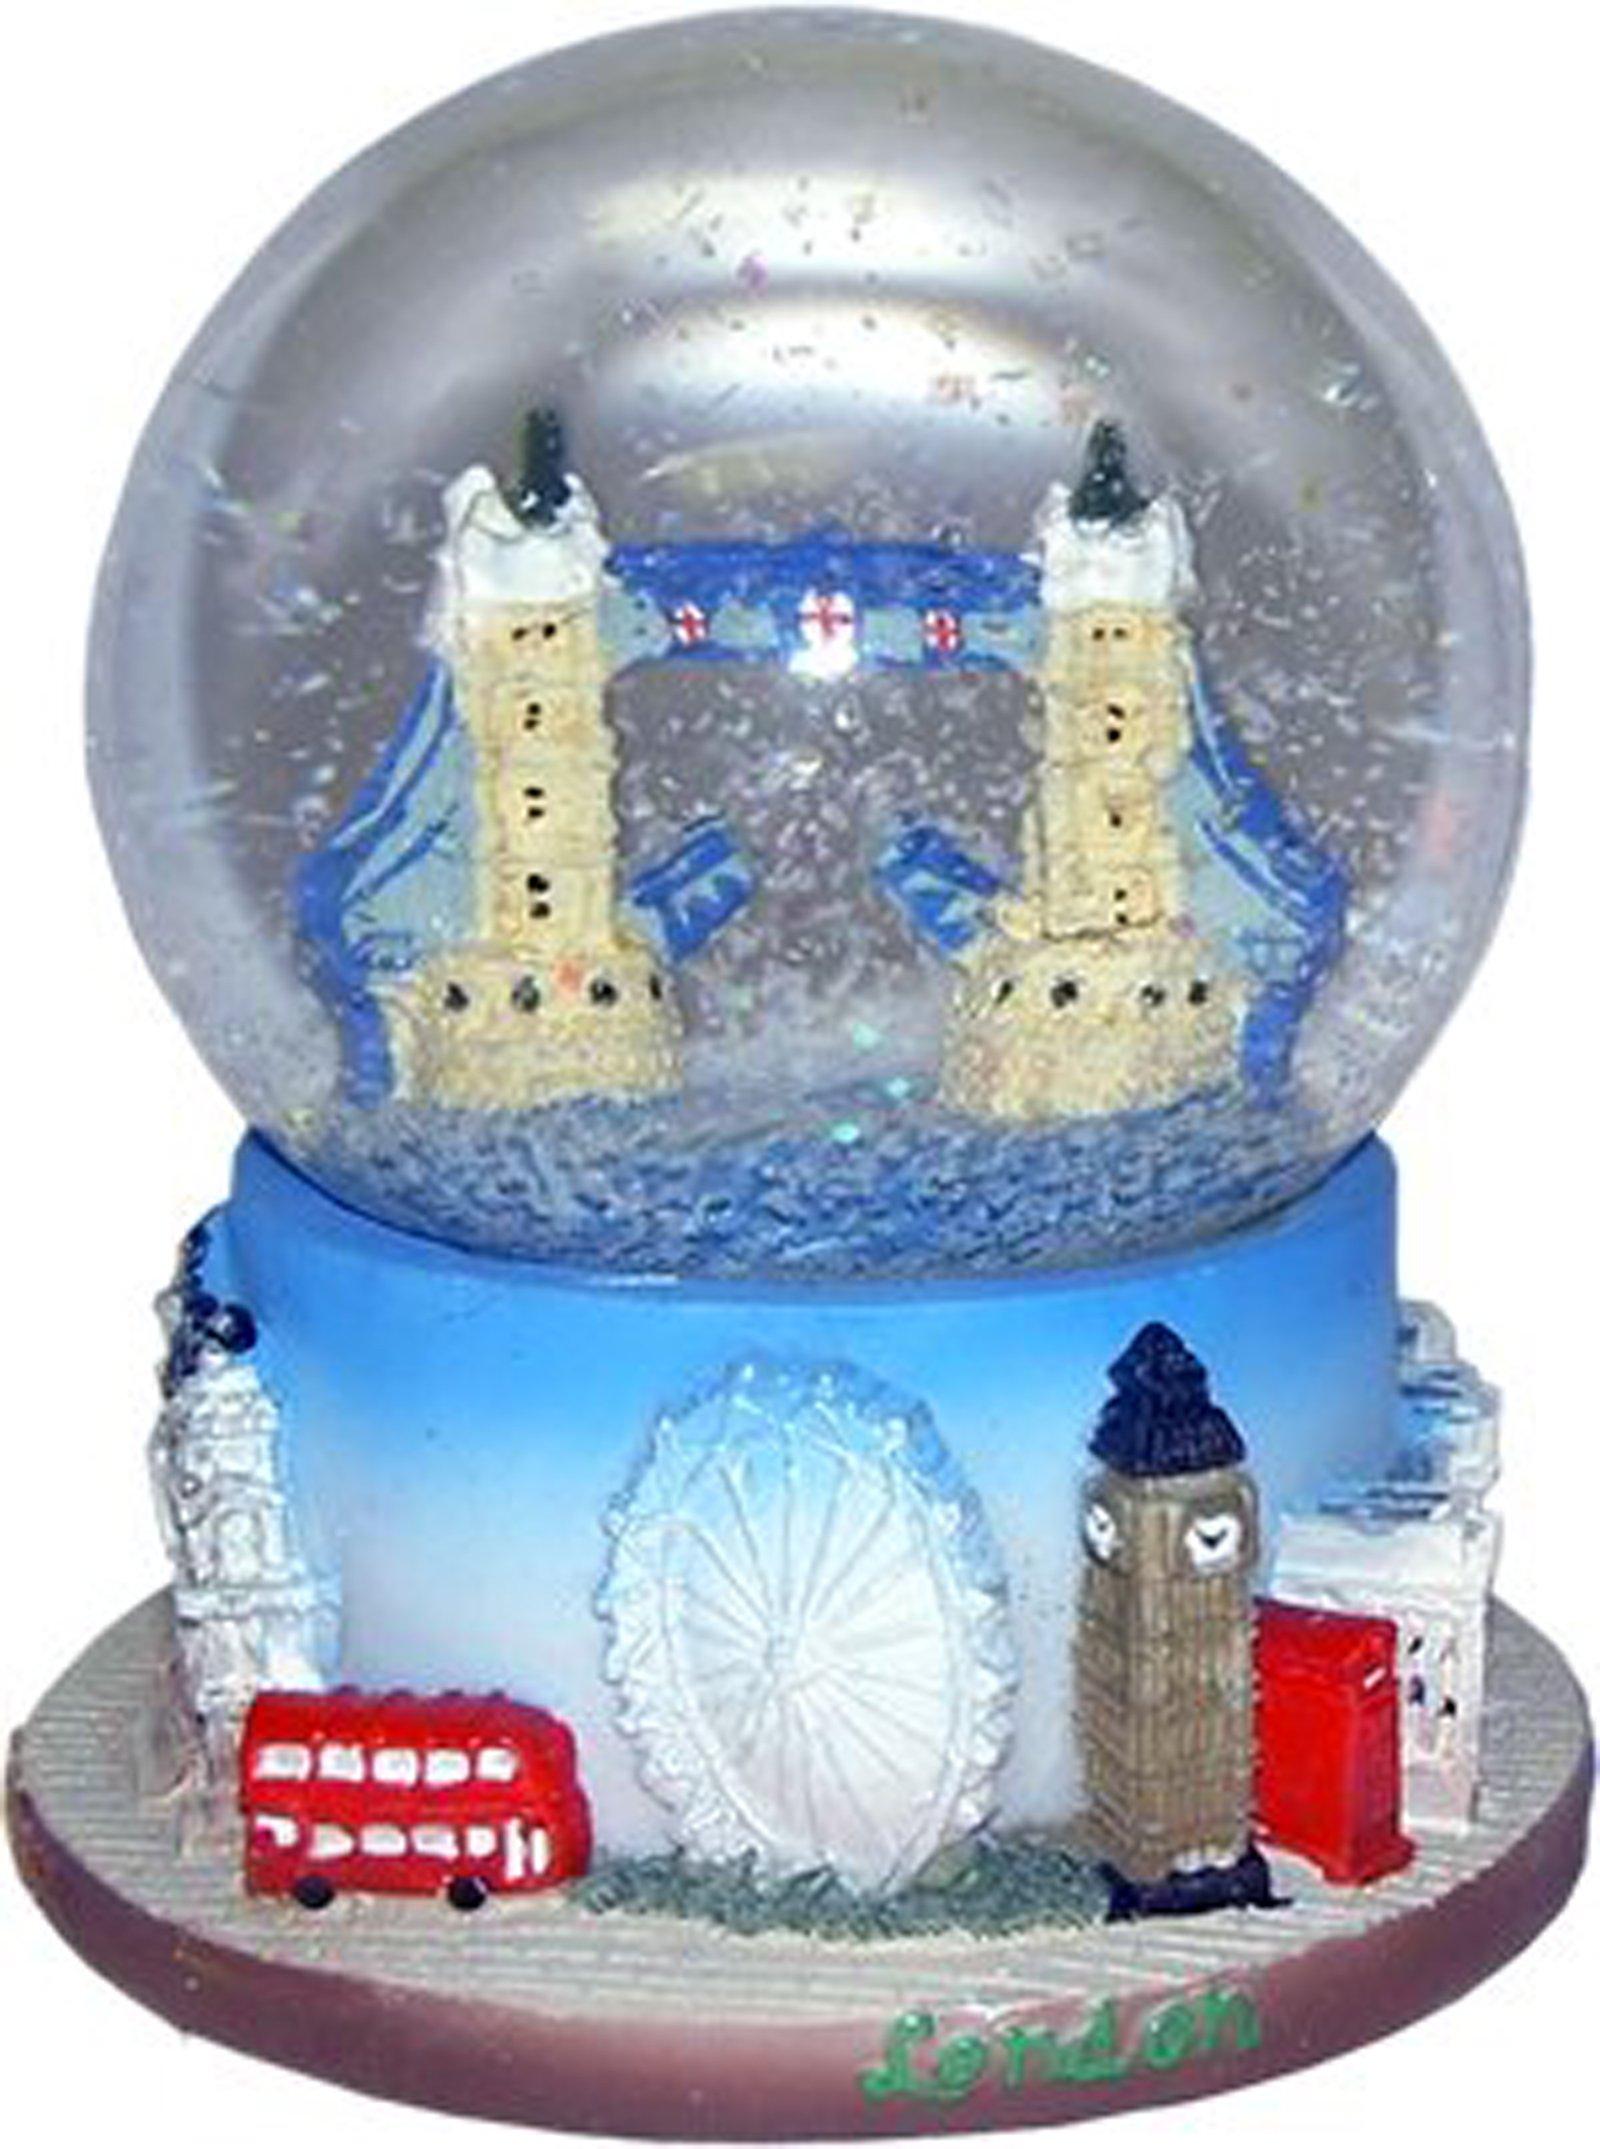 Snow Globe (Small)- Tower Bridge, Detailing Famous London Landmark Tower Bridge.